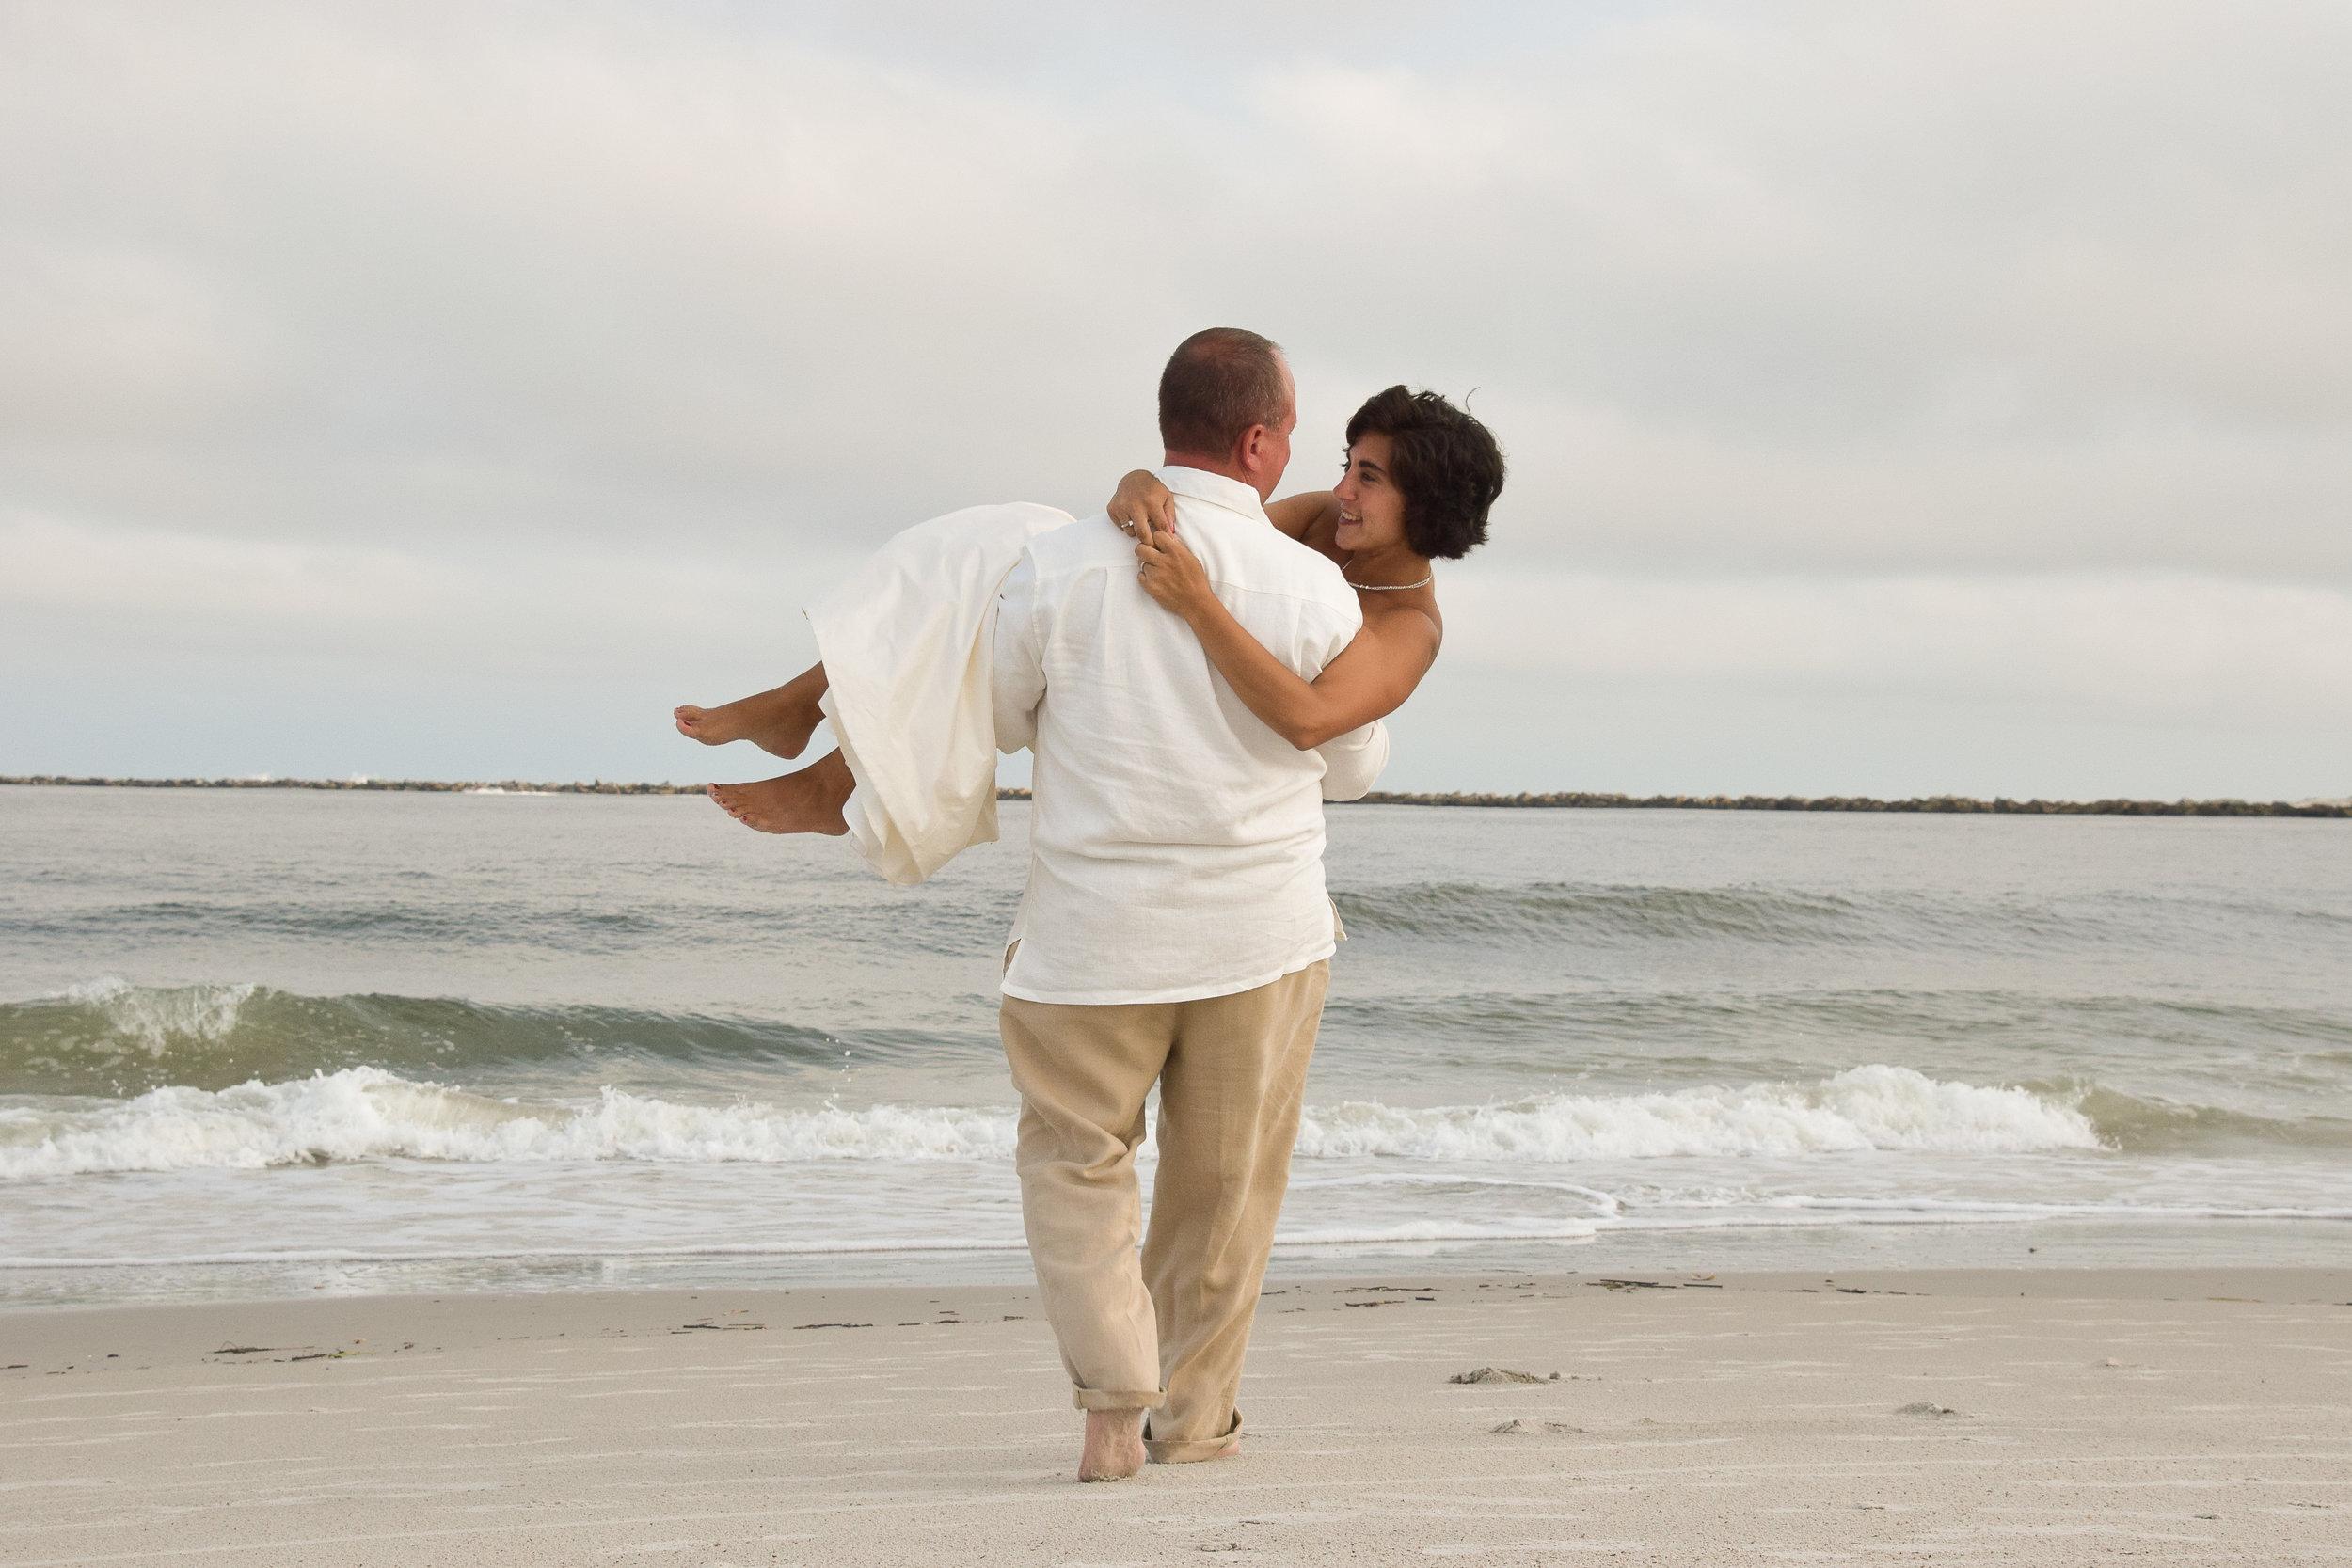 Groom carrying his bride towards the Ocean.